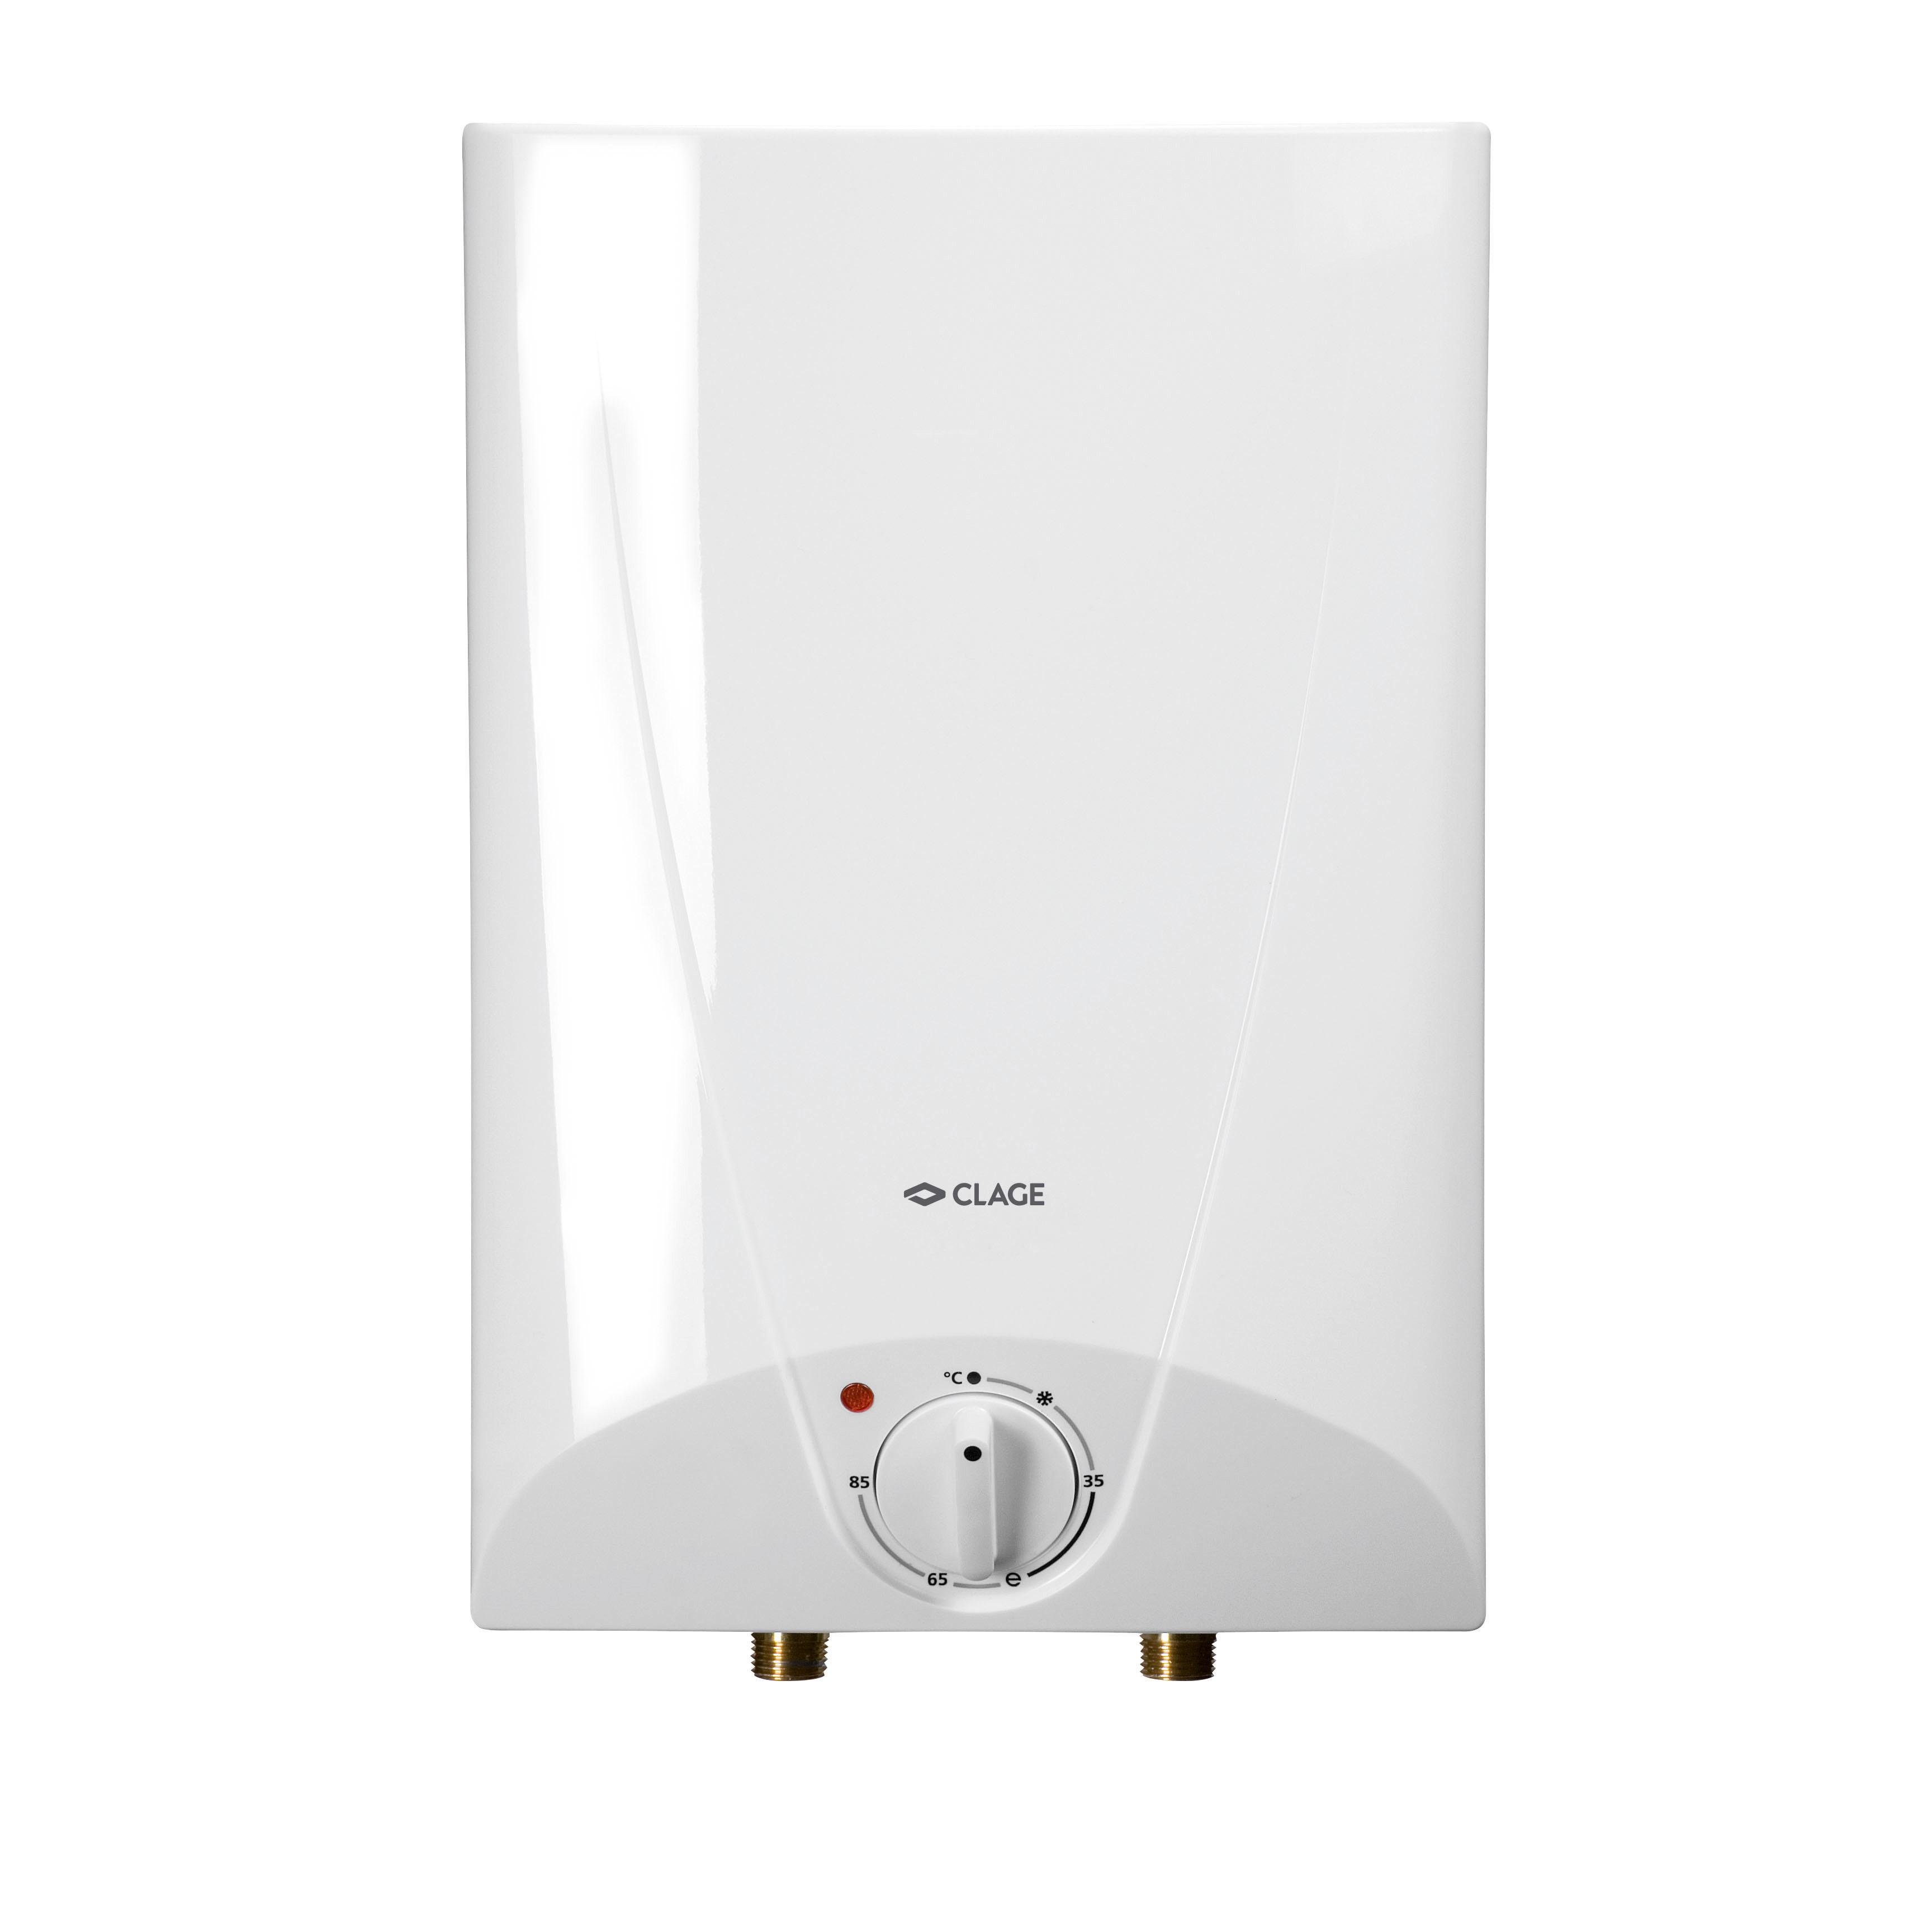 CLAGE S5-O elektrický ohřívač nad umyvadlo 2,0kW/230V 4100-41052